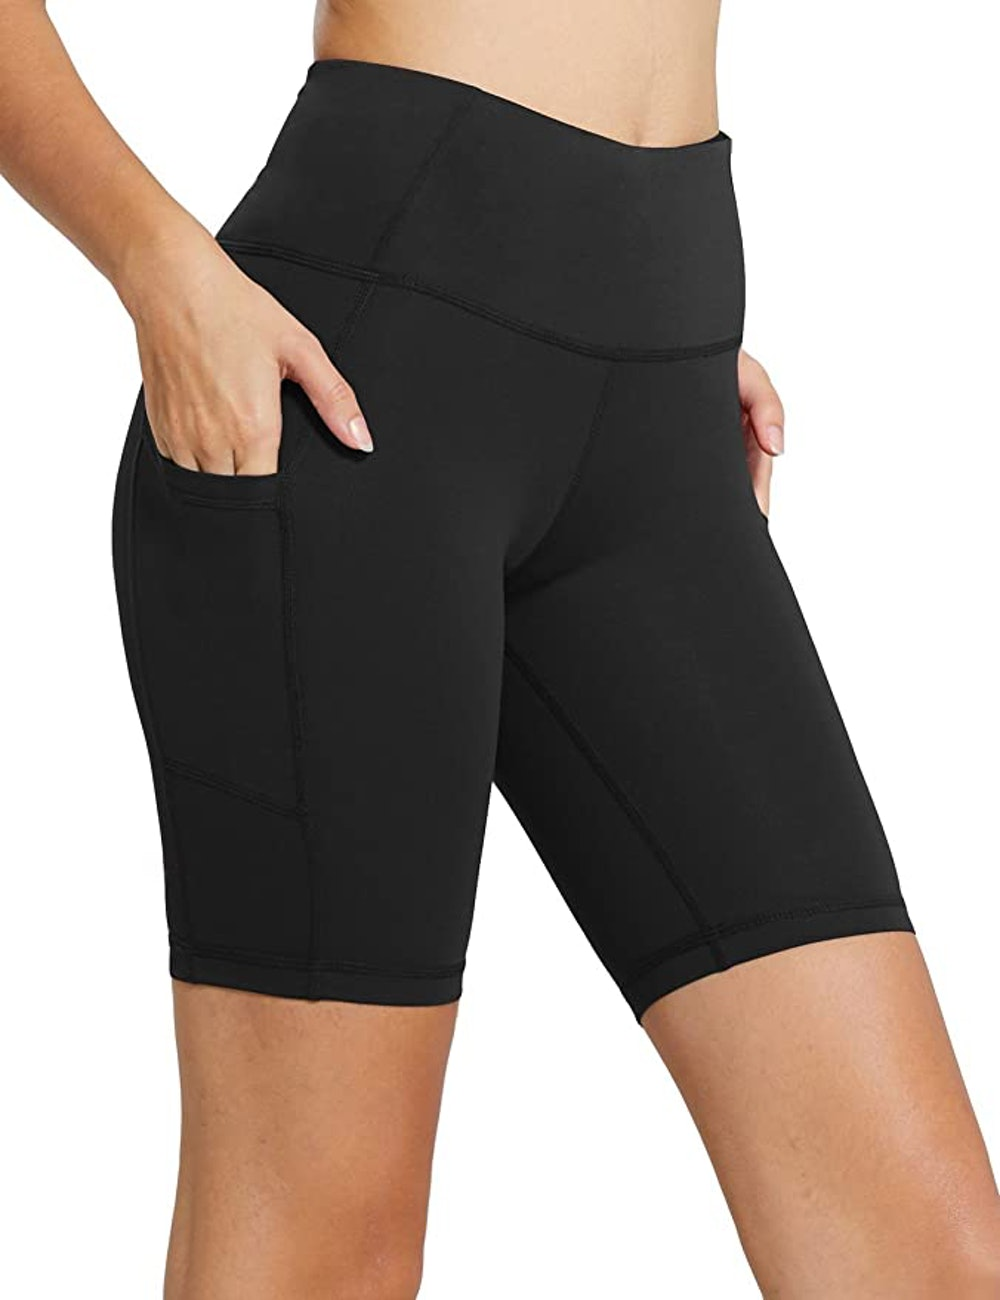 BALEAF Women's Compression Exercise Shorts